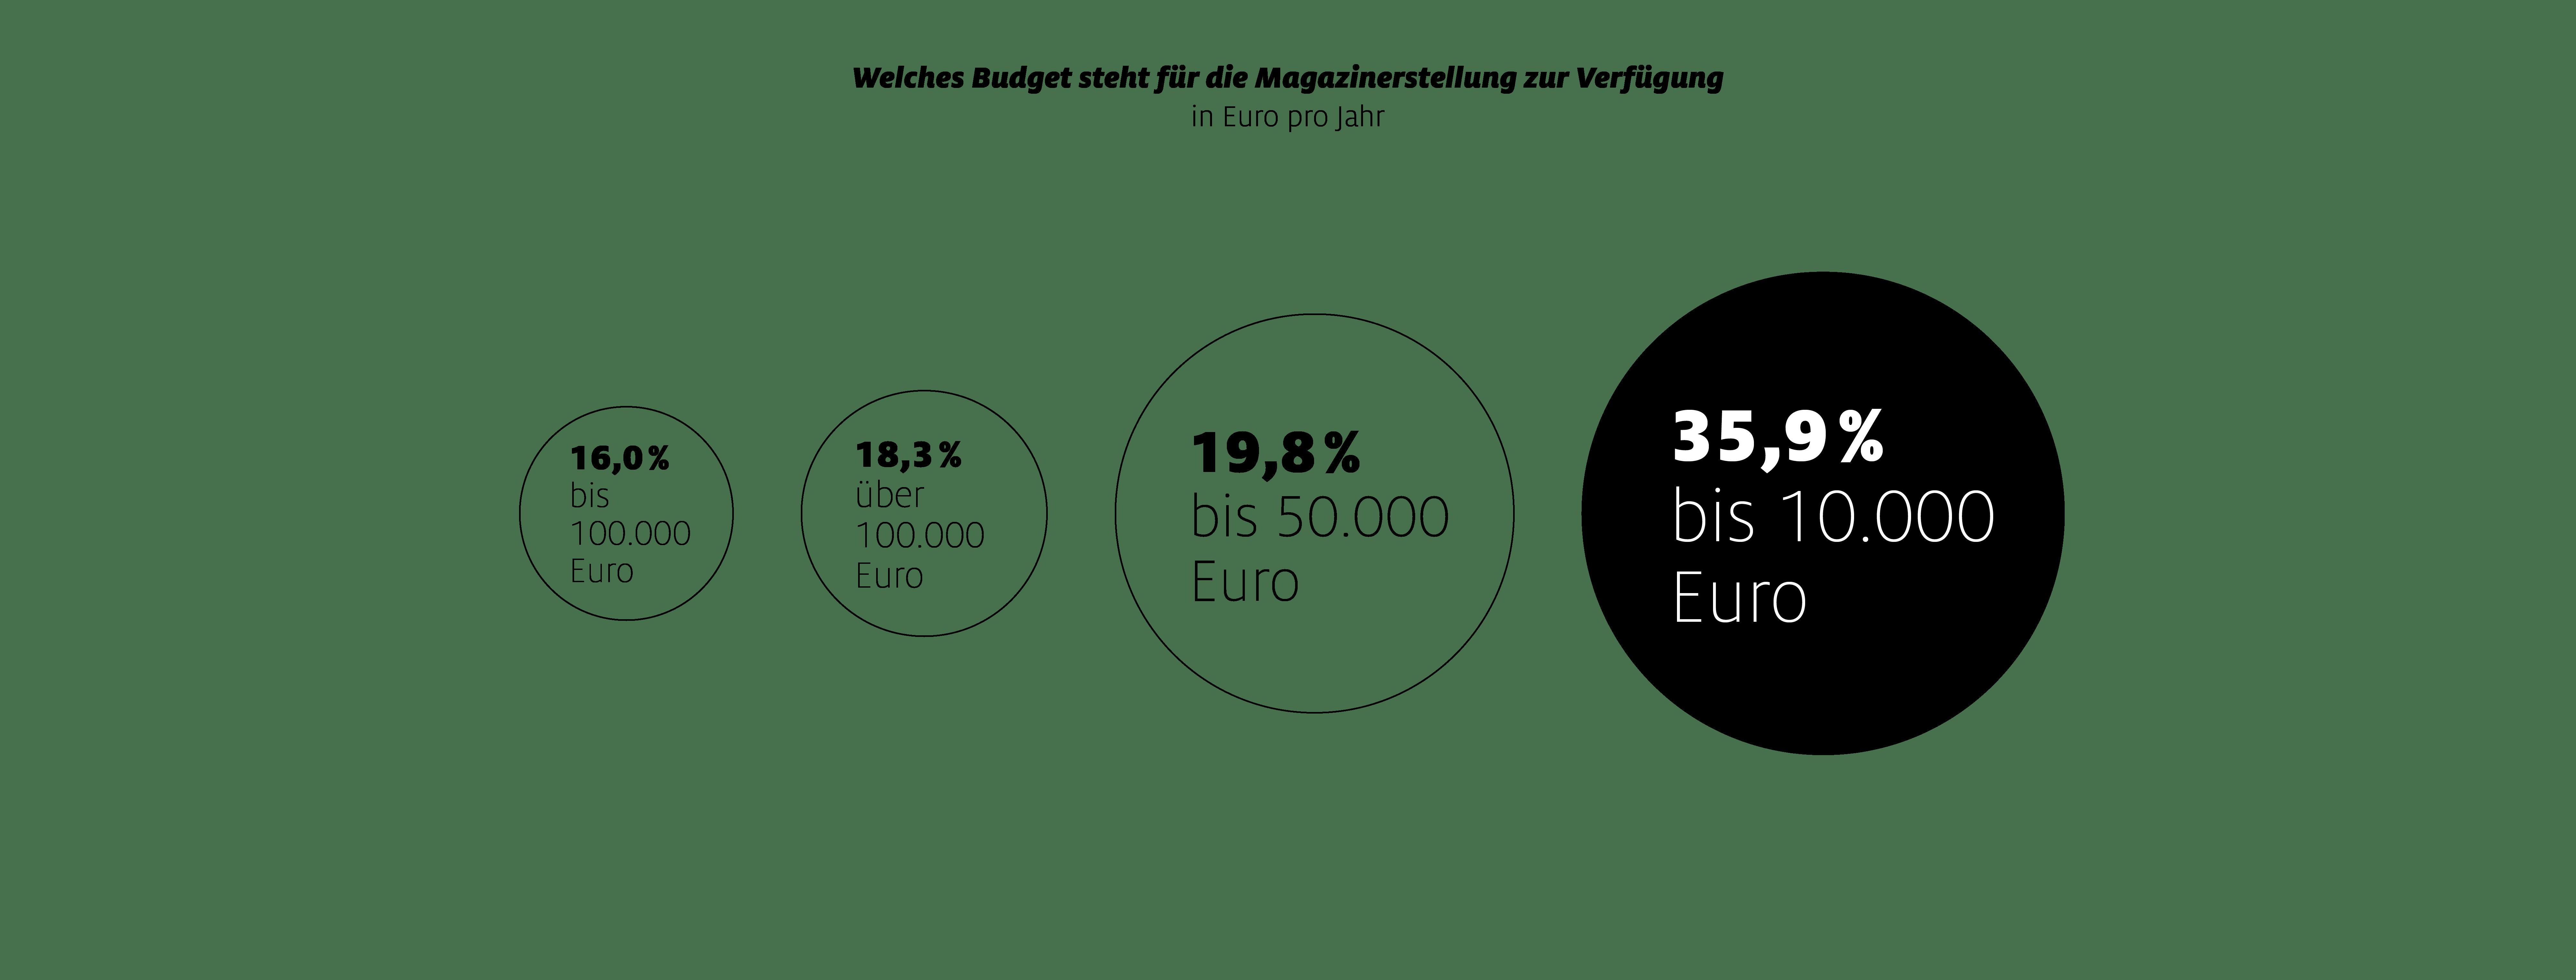 Grafik_Budget_Magazin_1920